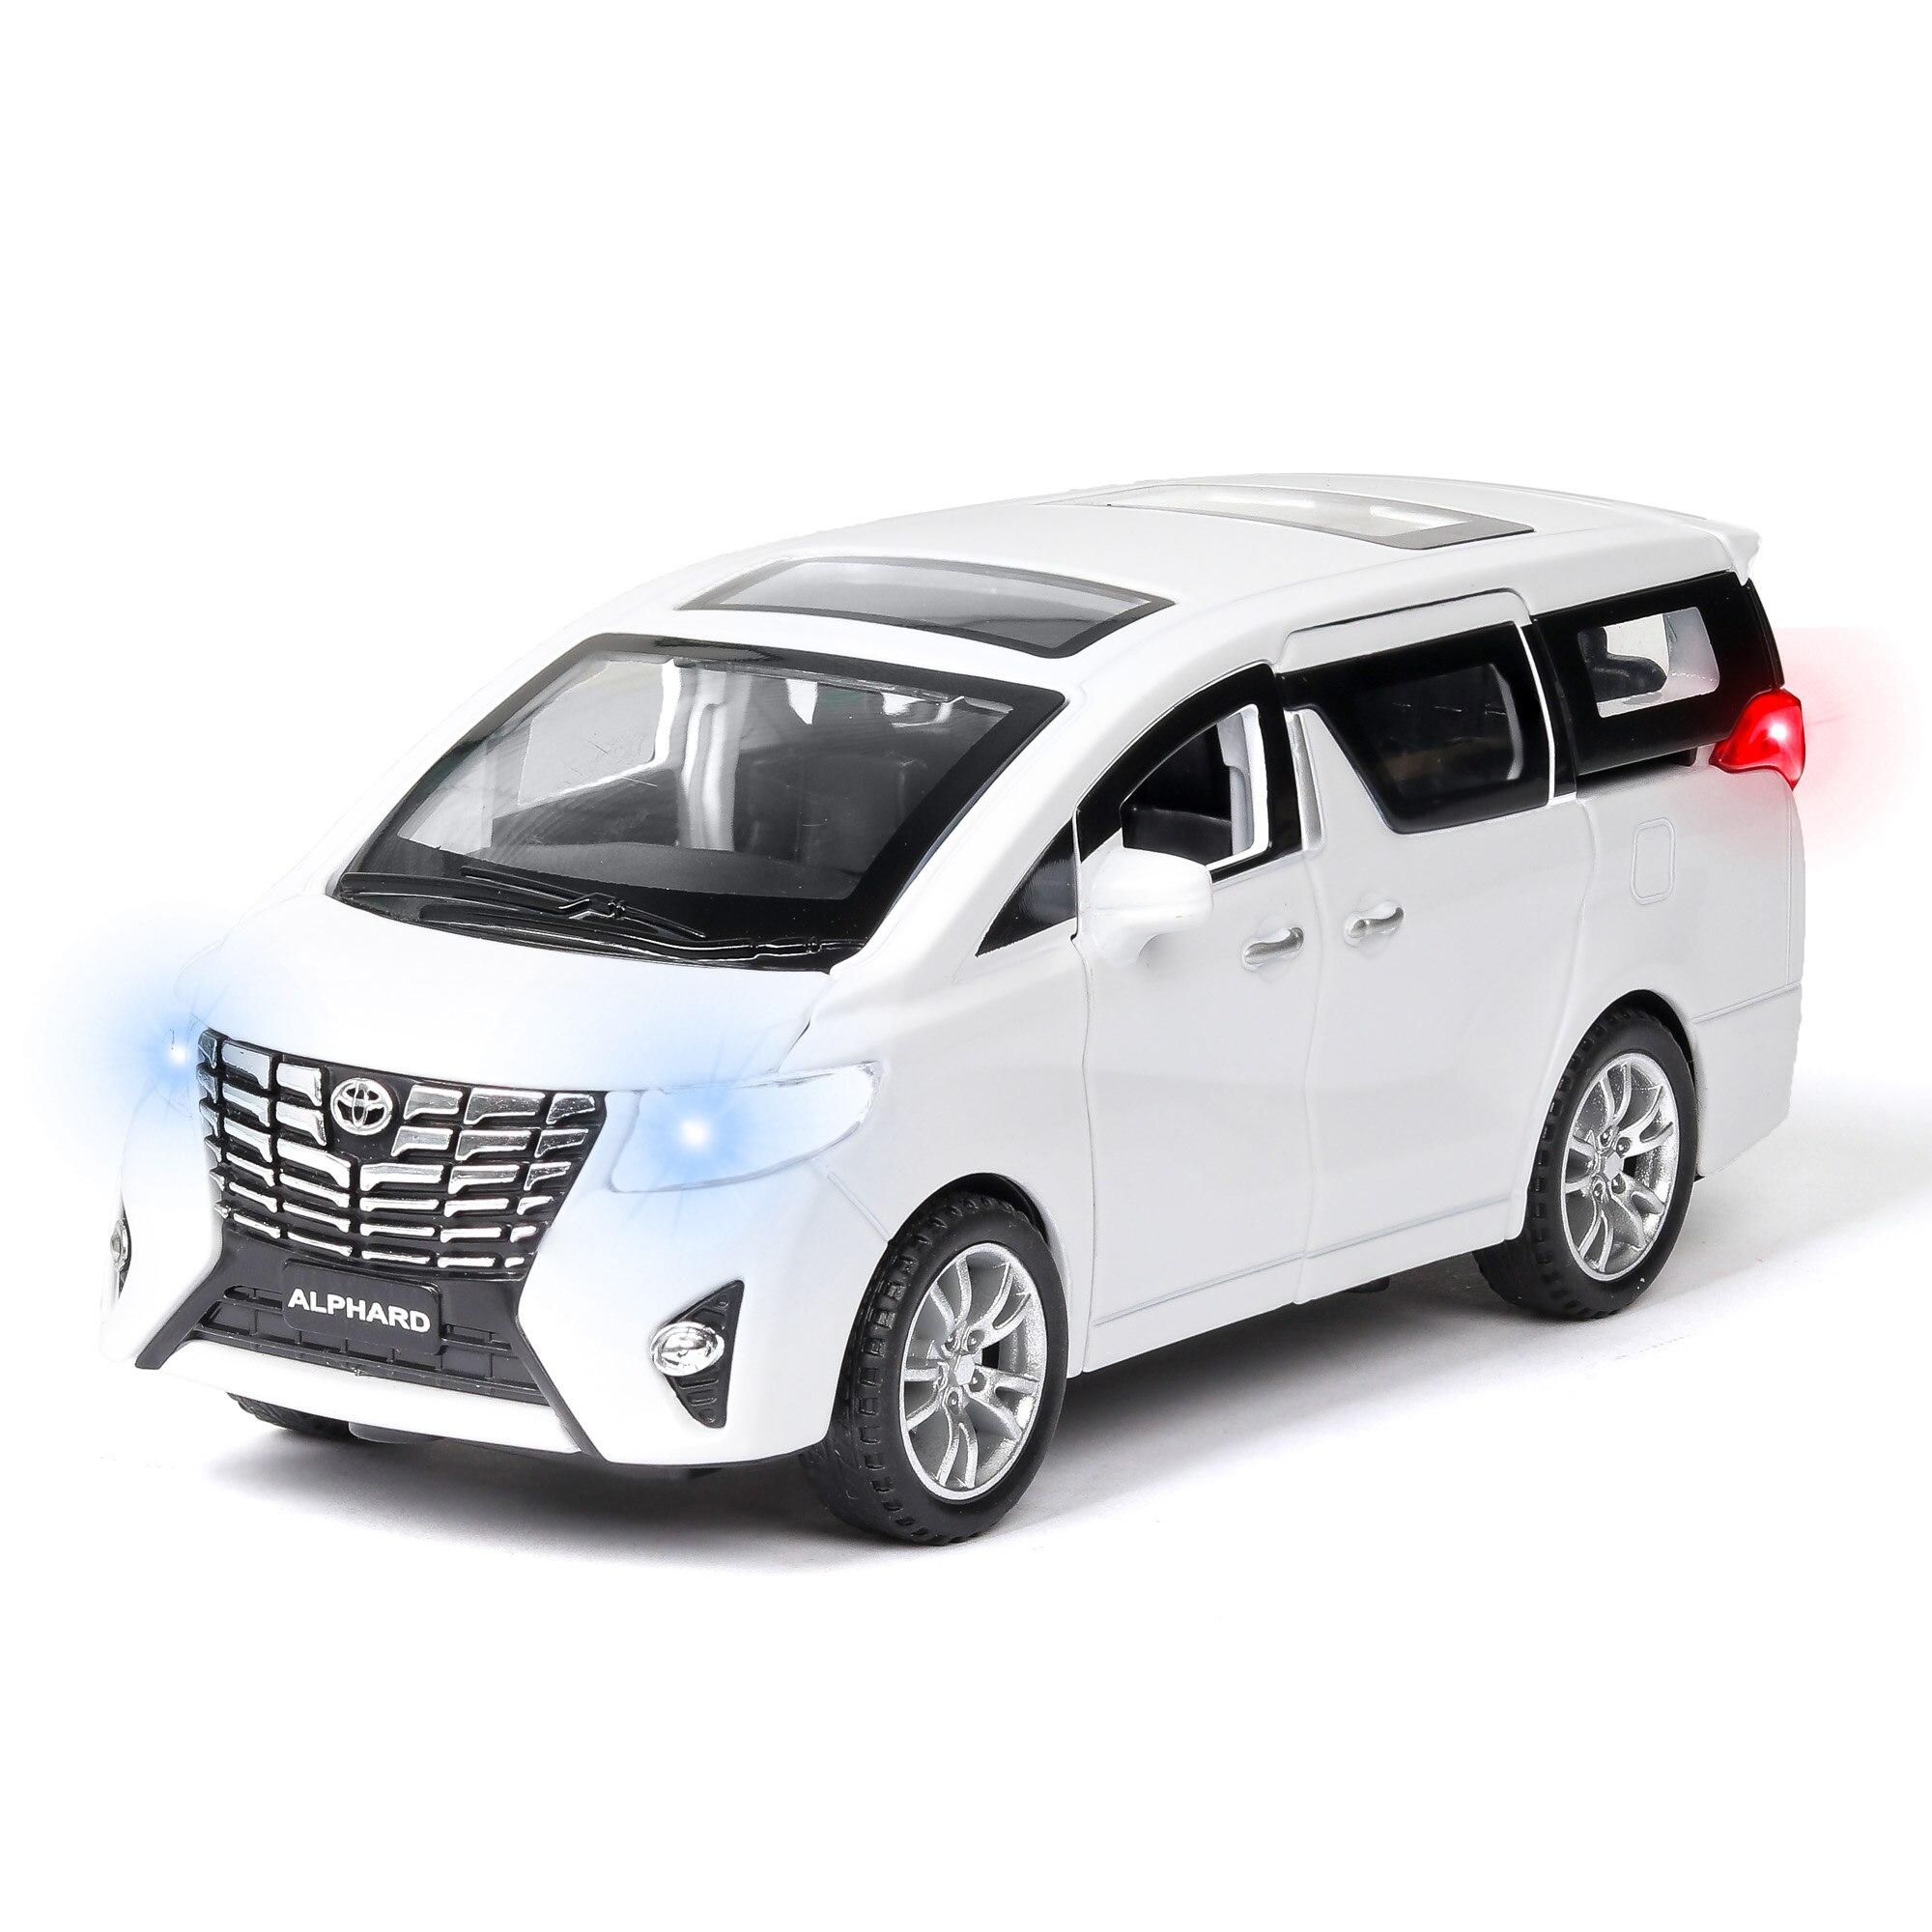 High Simitation 1:32 New Toyota Alphard MPV Model Alloy Pull Back Car Model 6 Open The Door Sound Light Kids Toys Free Shipping